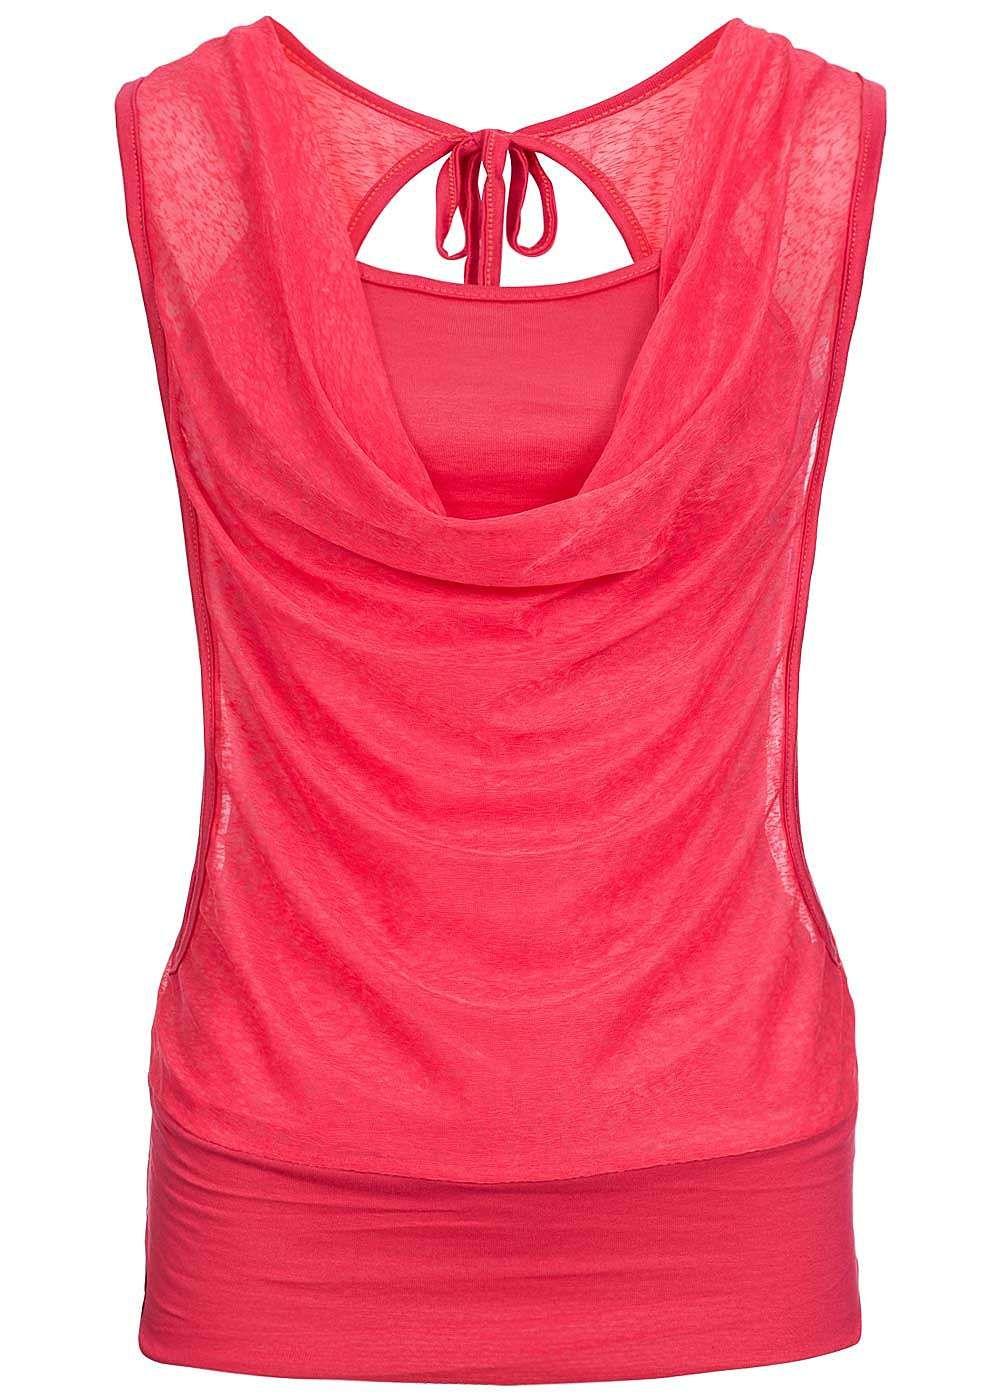 c68d192d882184 Styleboom Fashion Damen 2in1 Top Wasserfall Ausschnitt coral pink -  77onlineshop